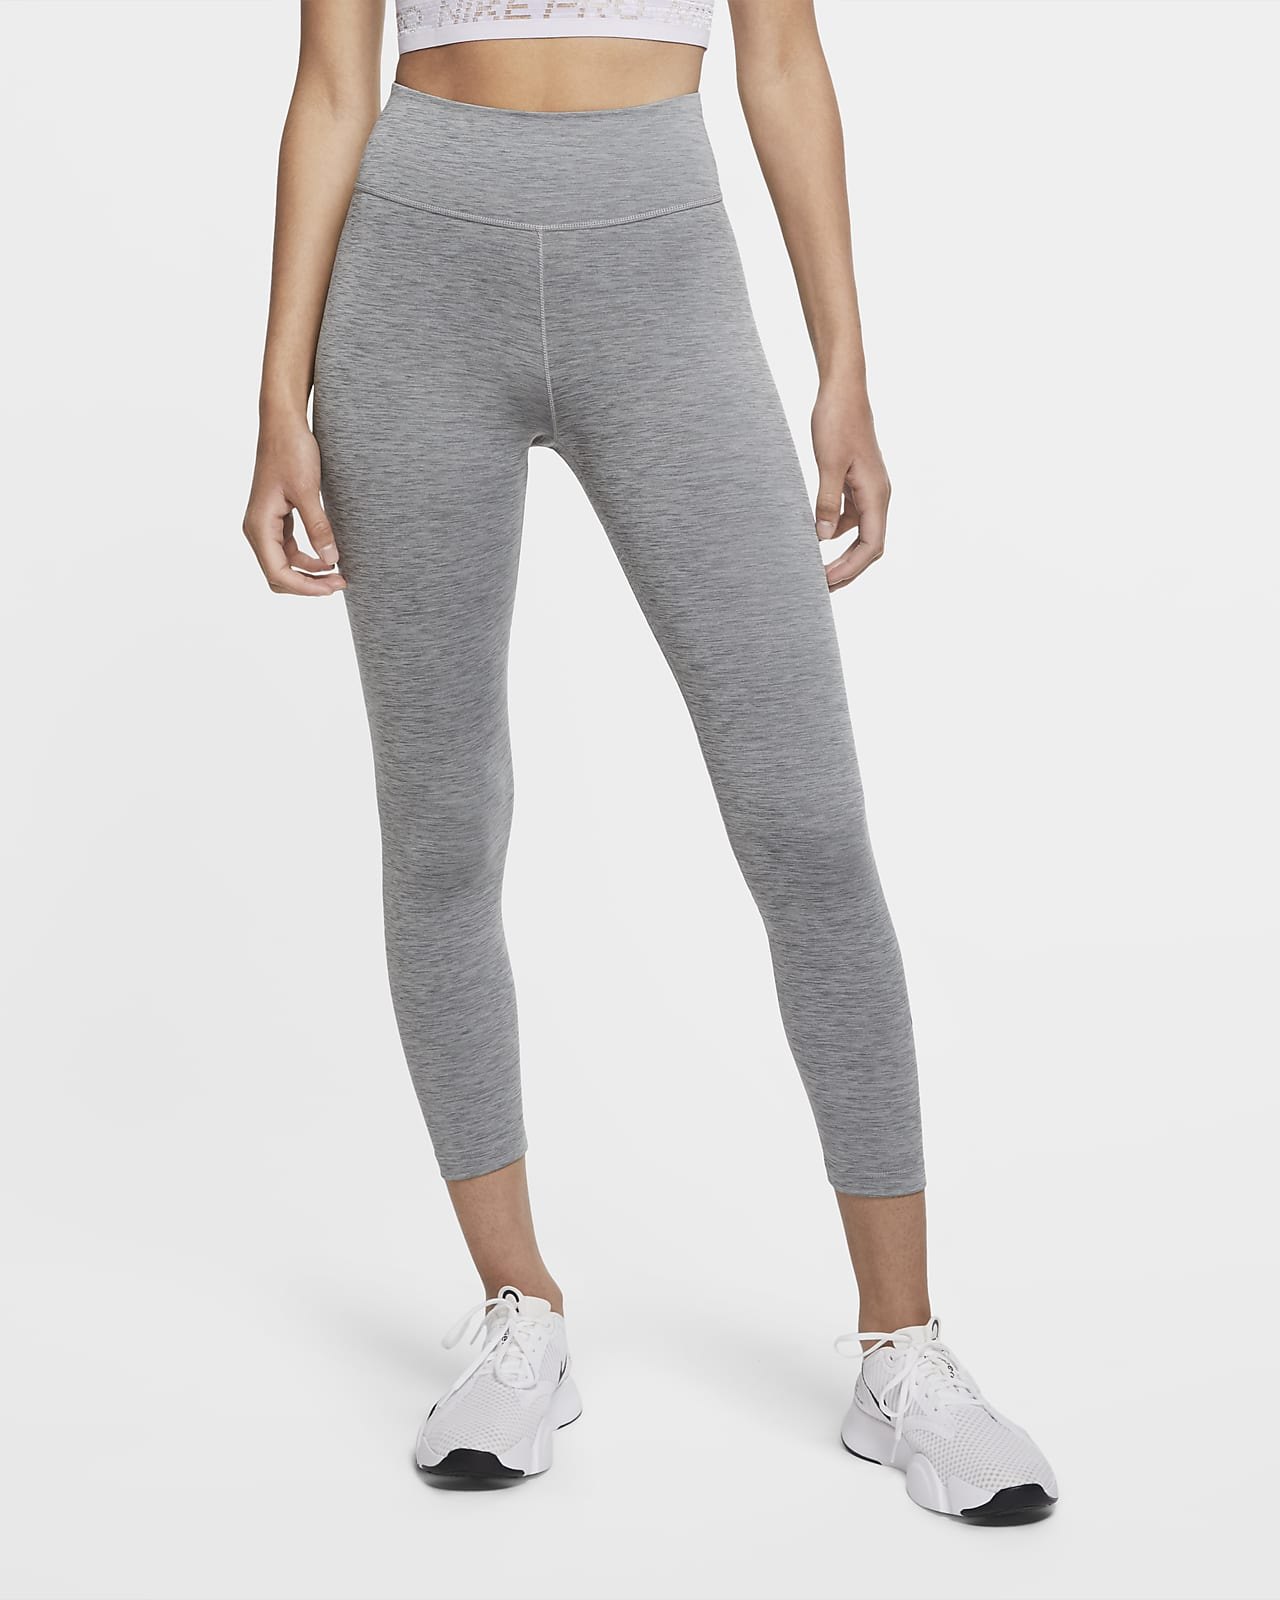 Nike One Women's Mid-Rise Crop Leggings